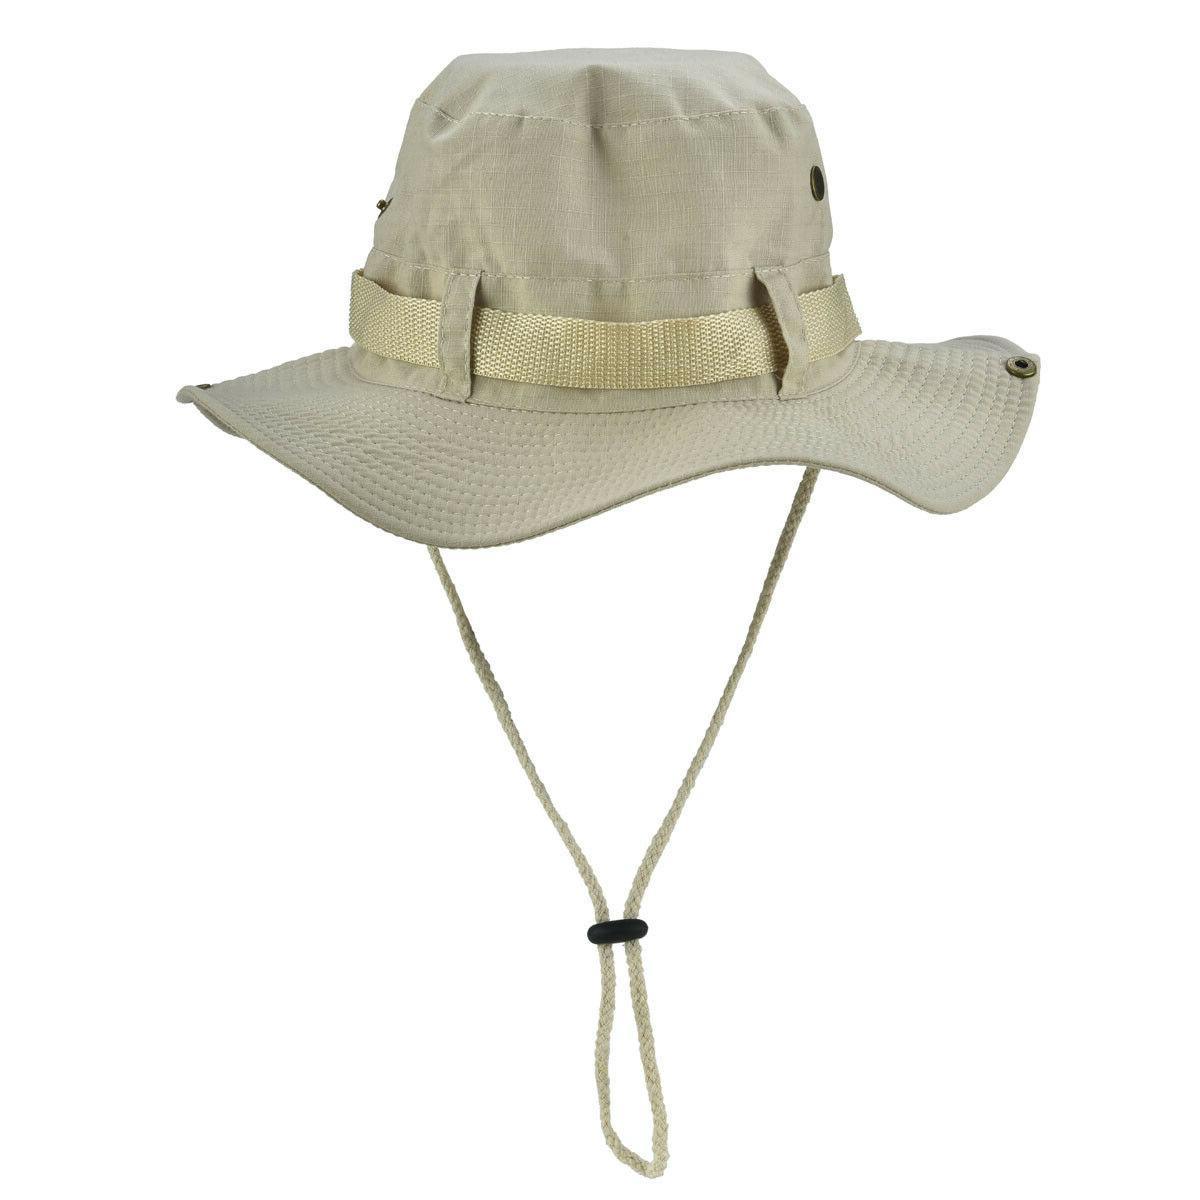 Boonie Bucket Fishing Hunting Wide Mesh Cap